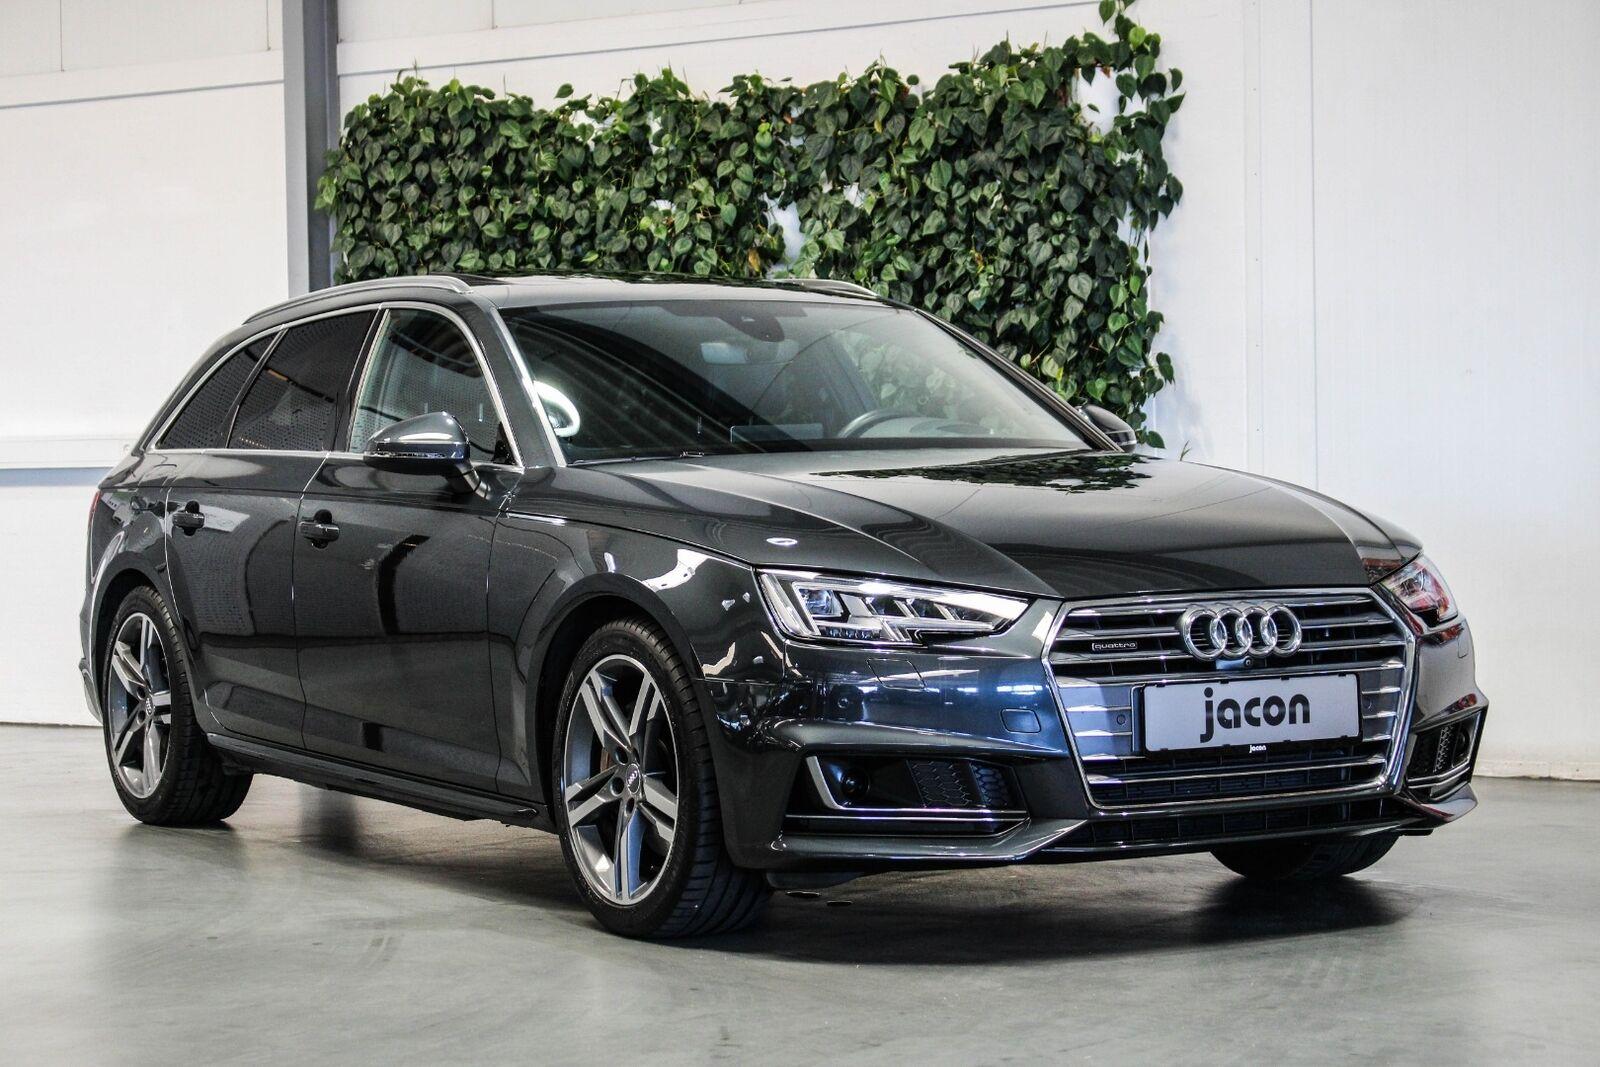 Audi A4 2,0 TDi 190 S-line Avant quat S-tr 5d - 3.820 kr.